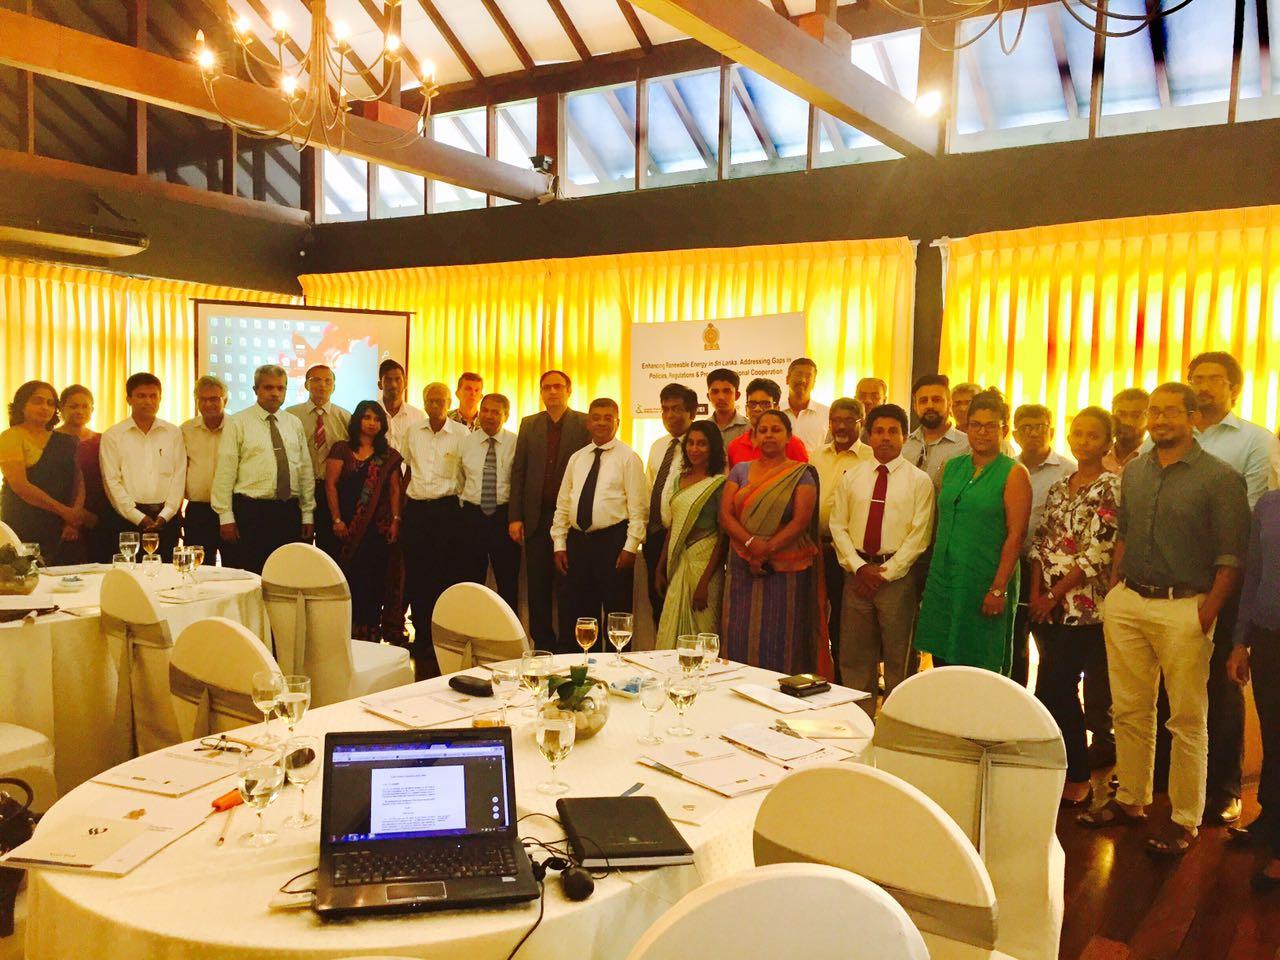 Enhancing Renewable Energy in Sri Lanka: Addressing Gaps in Policies & Regulations & Promoting Regional Cooperation-20th September 2017-Waters Edge Hotel, Battaramulla Sri Lanka